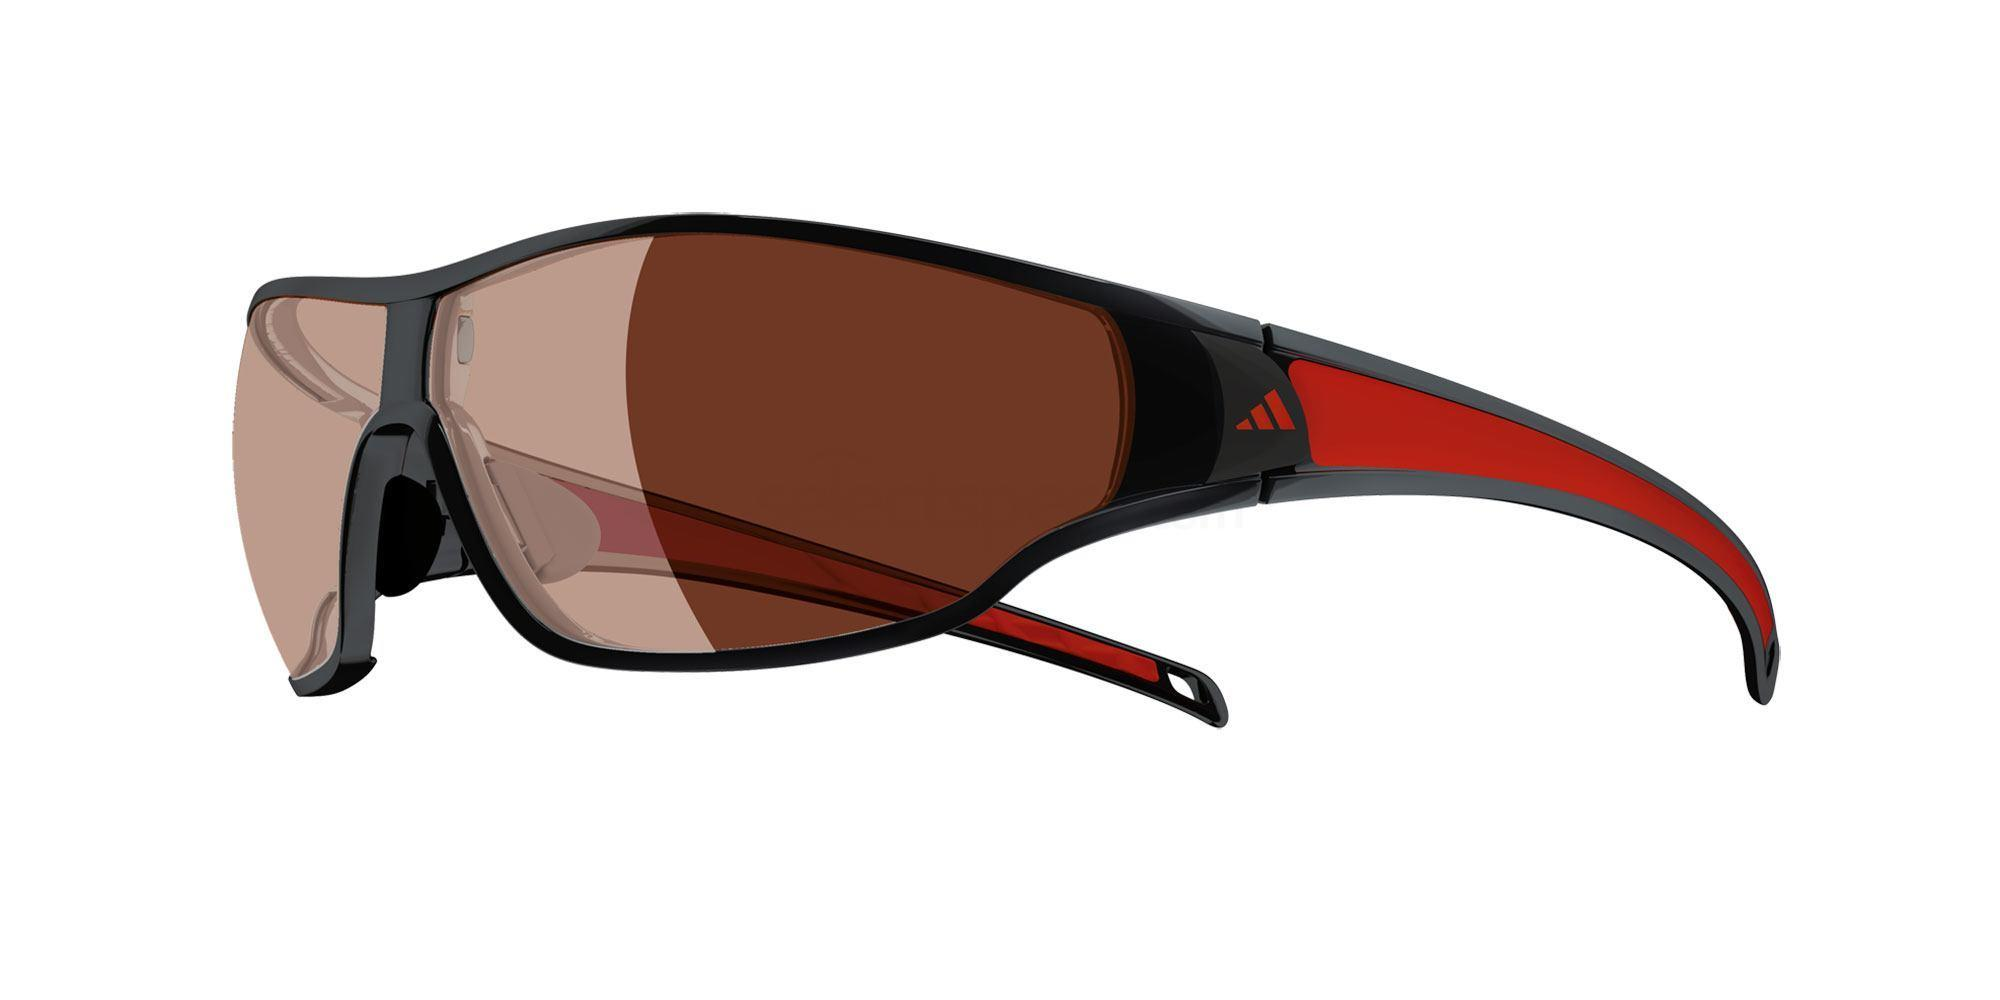 00 6051 a191 Tycane L Polarized Sunglasses, Adidas